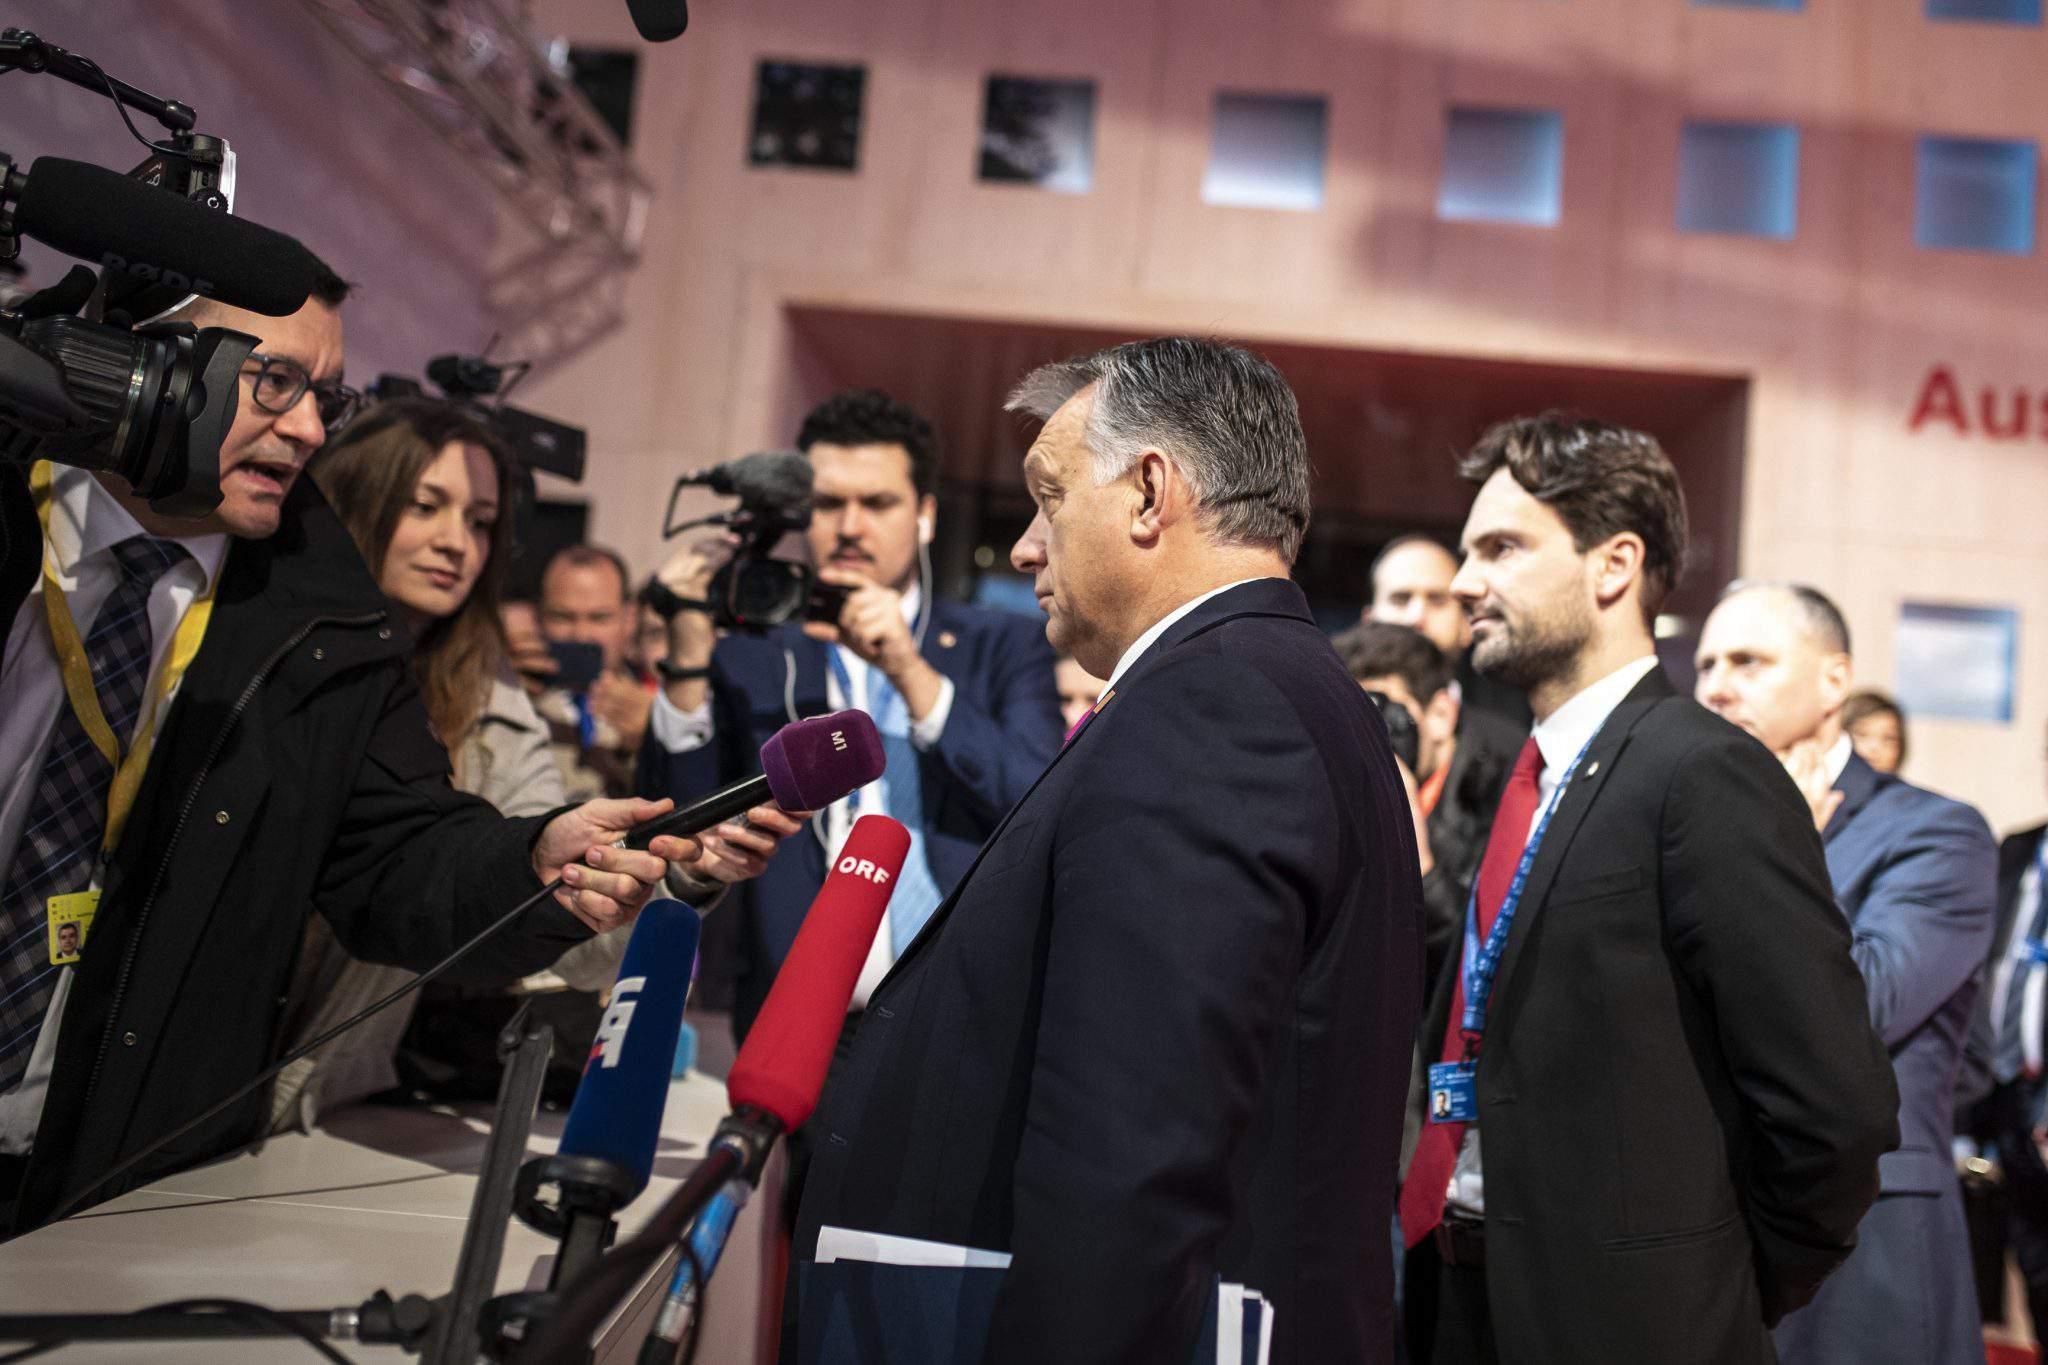 Orbán Vienna